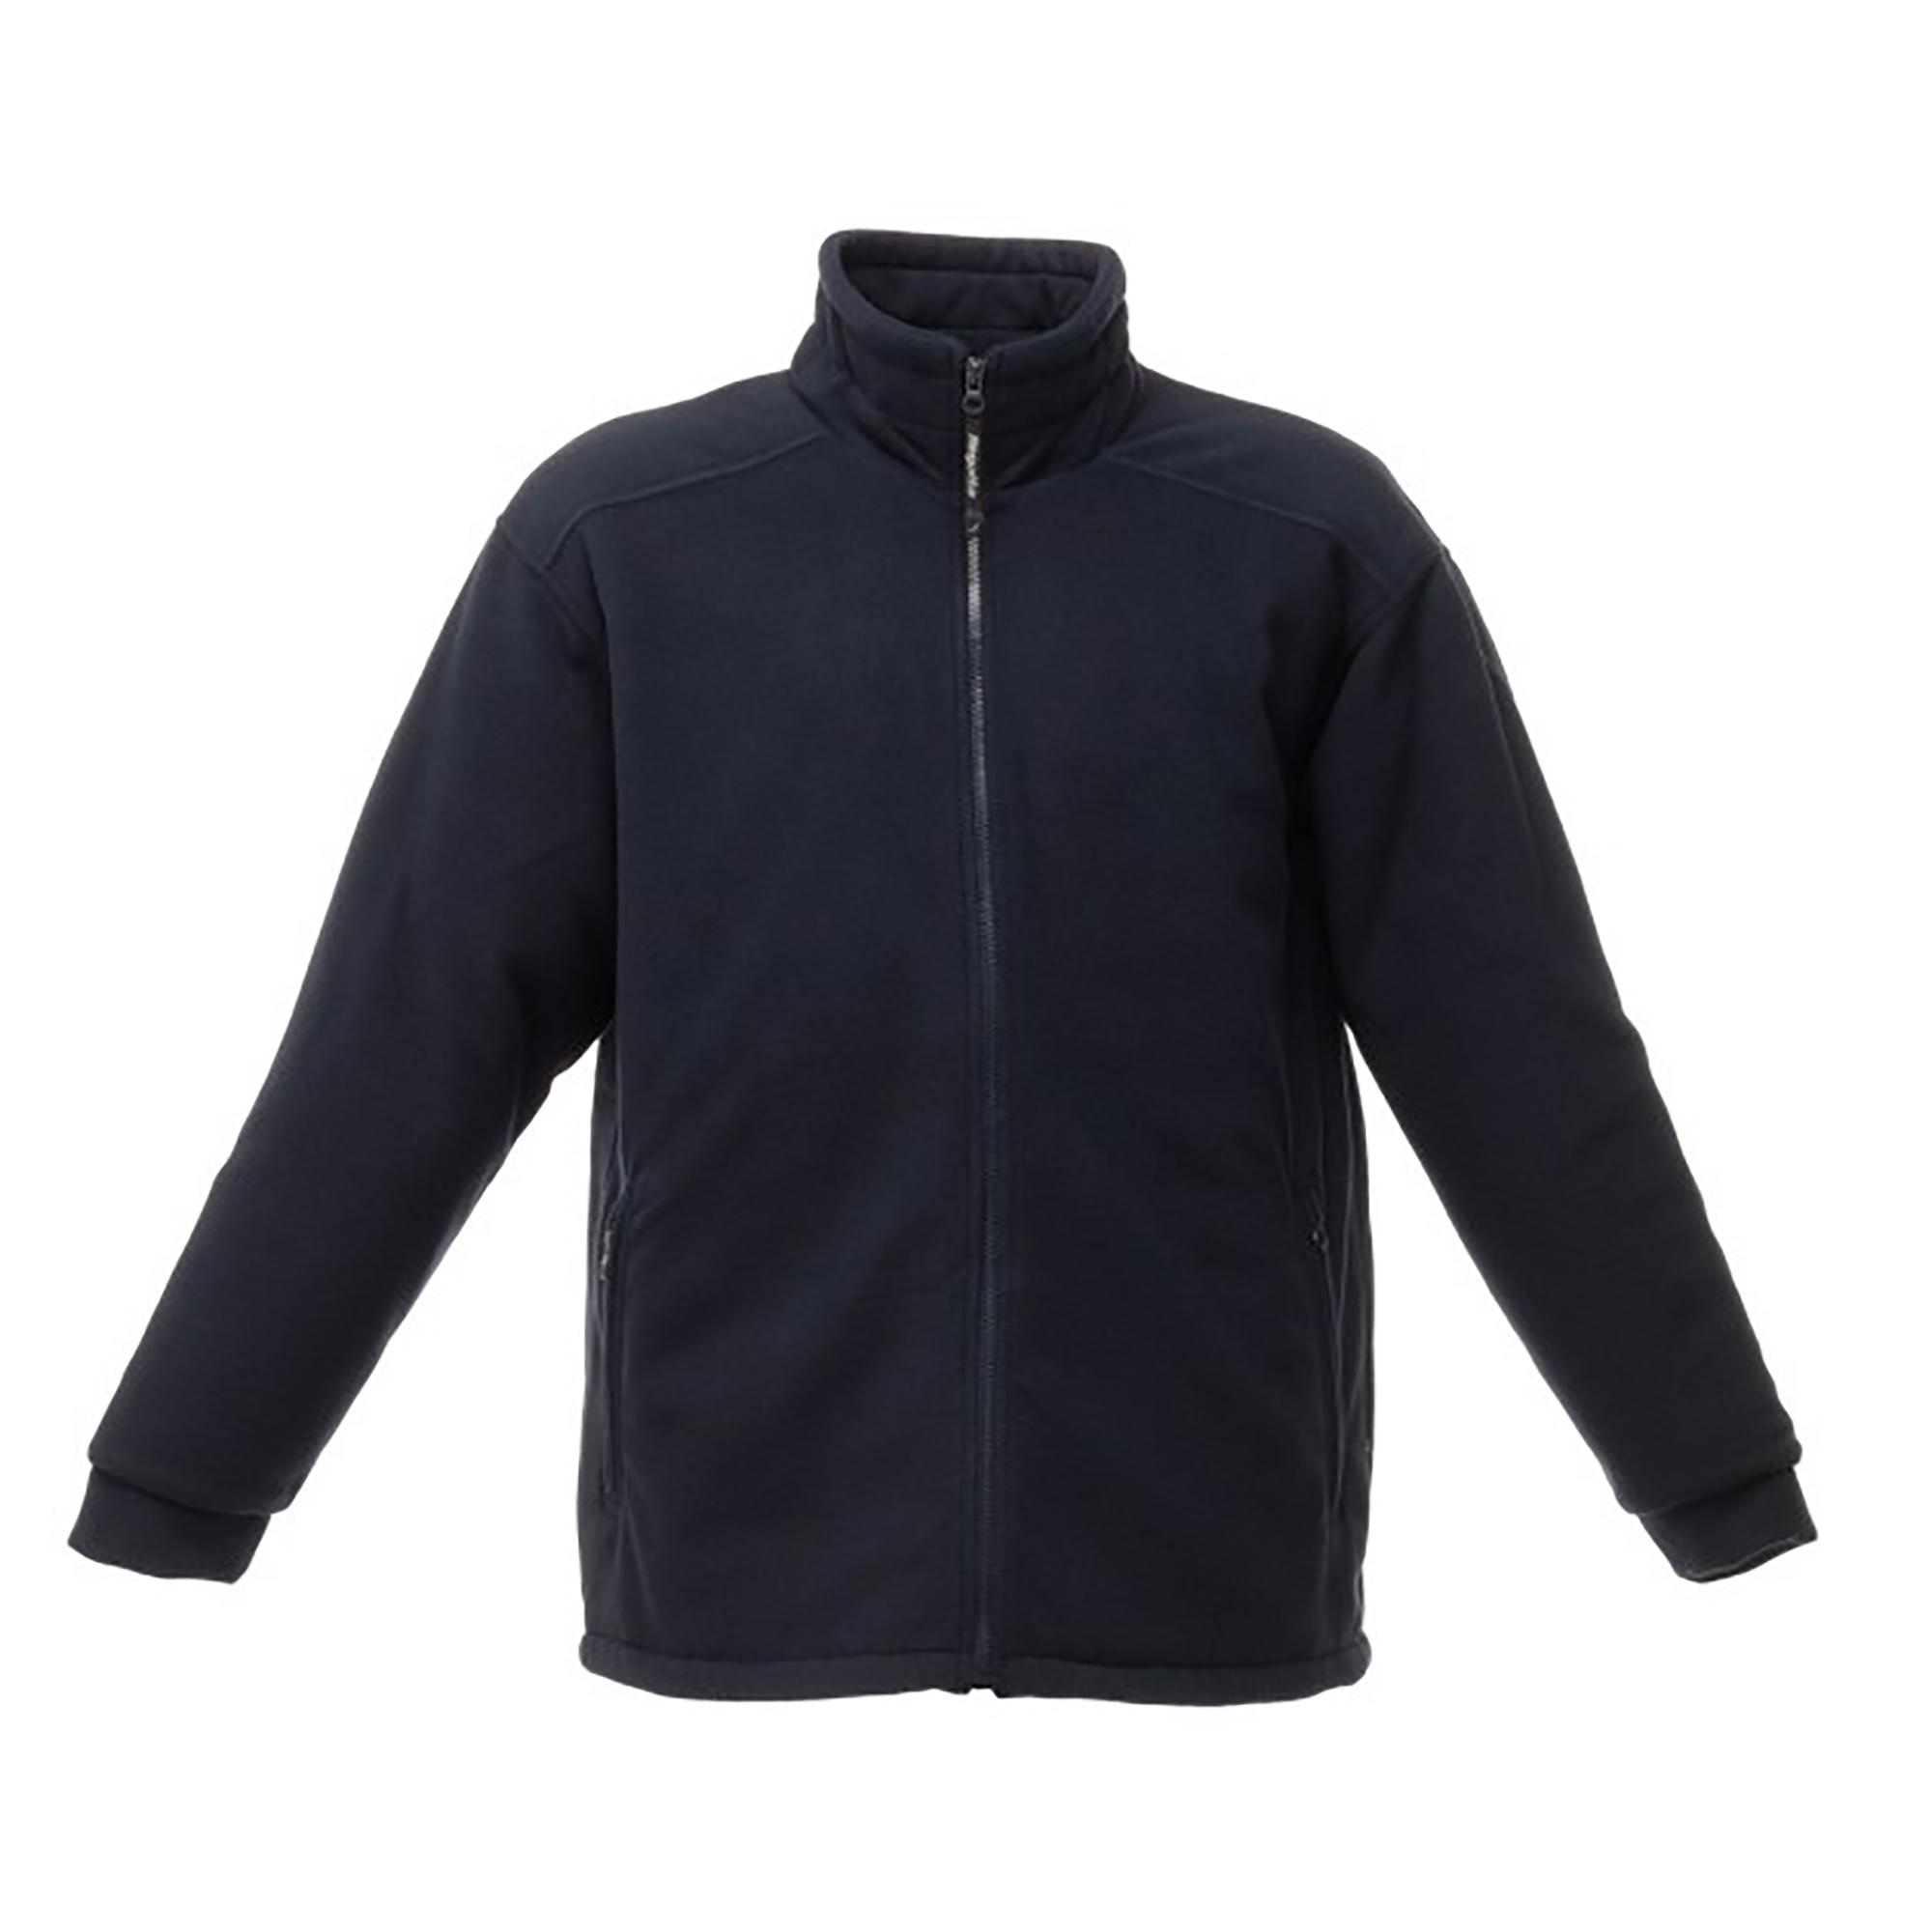 Regatta Mens Asgard II Quilted Fleece Jacket (Thermo-guard Insulation) (S) (Dark Navy)